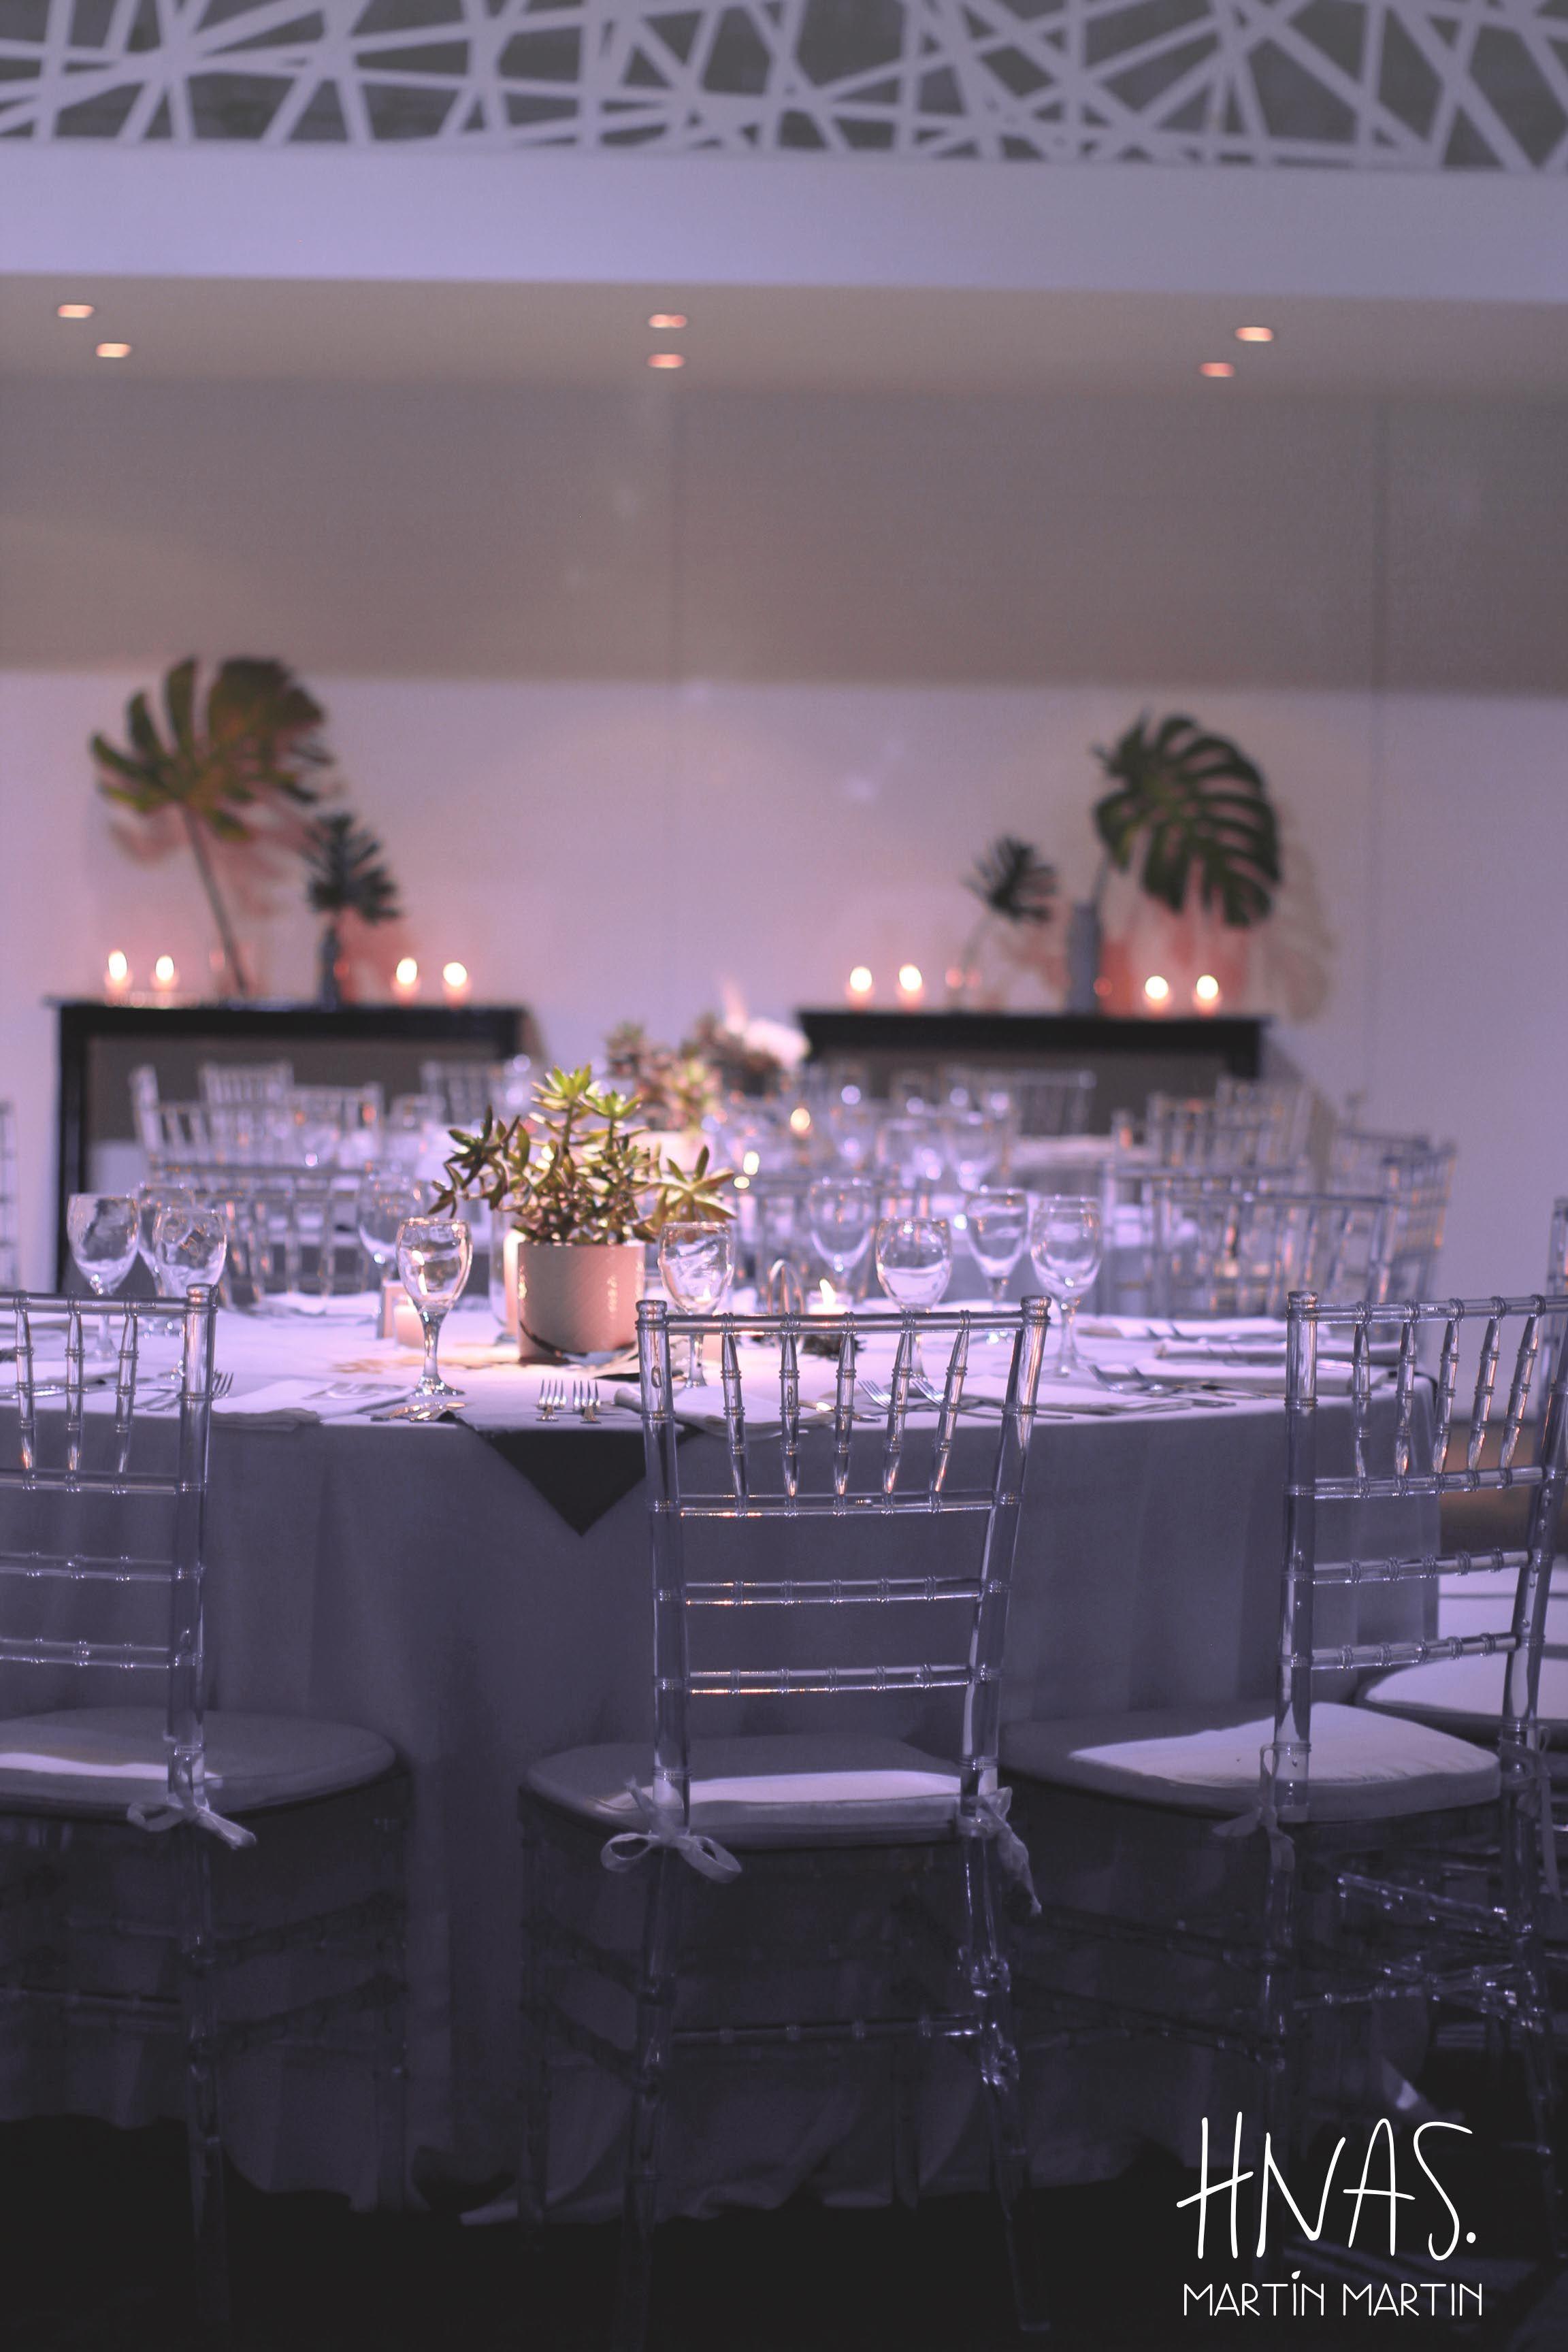 ambientacin bar mitzvah hotel the brick chrome plateado sillas tiffany cristal - Brick Hotel Decoration